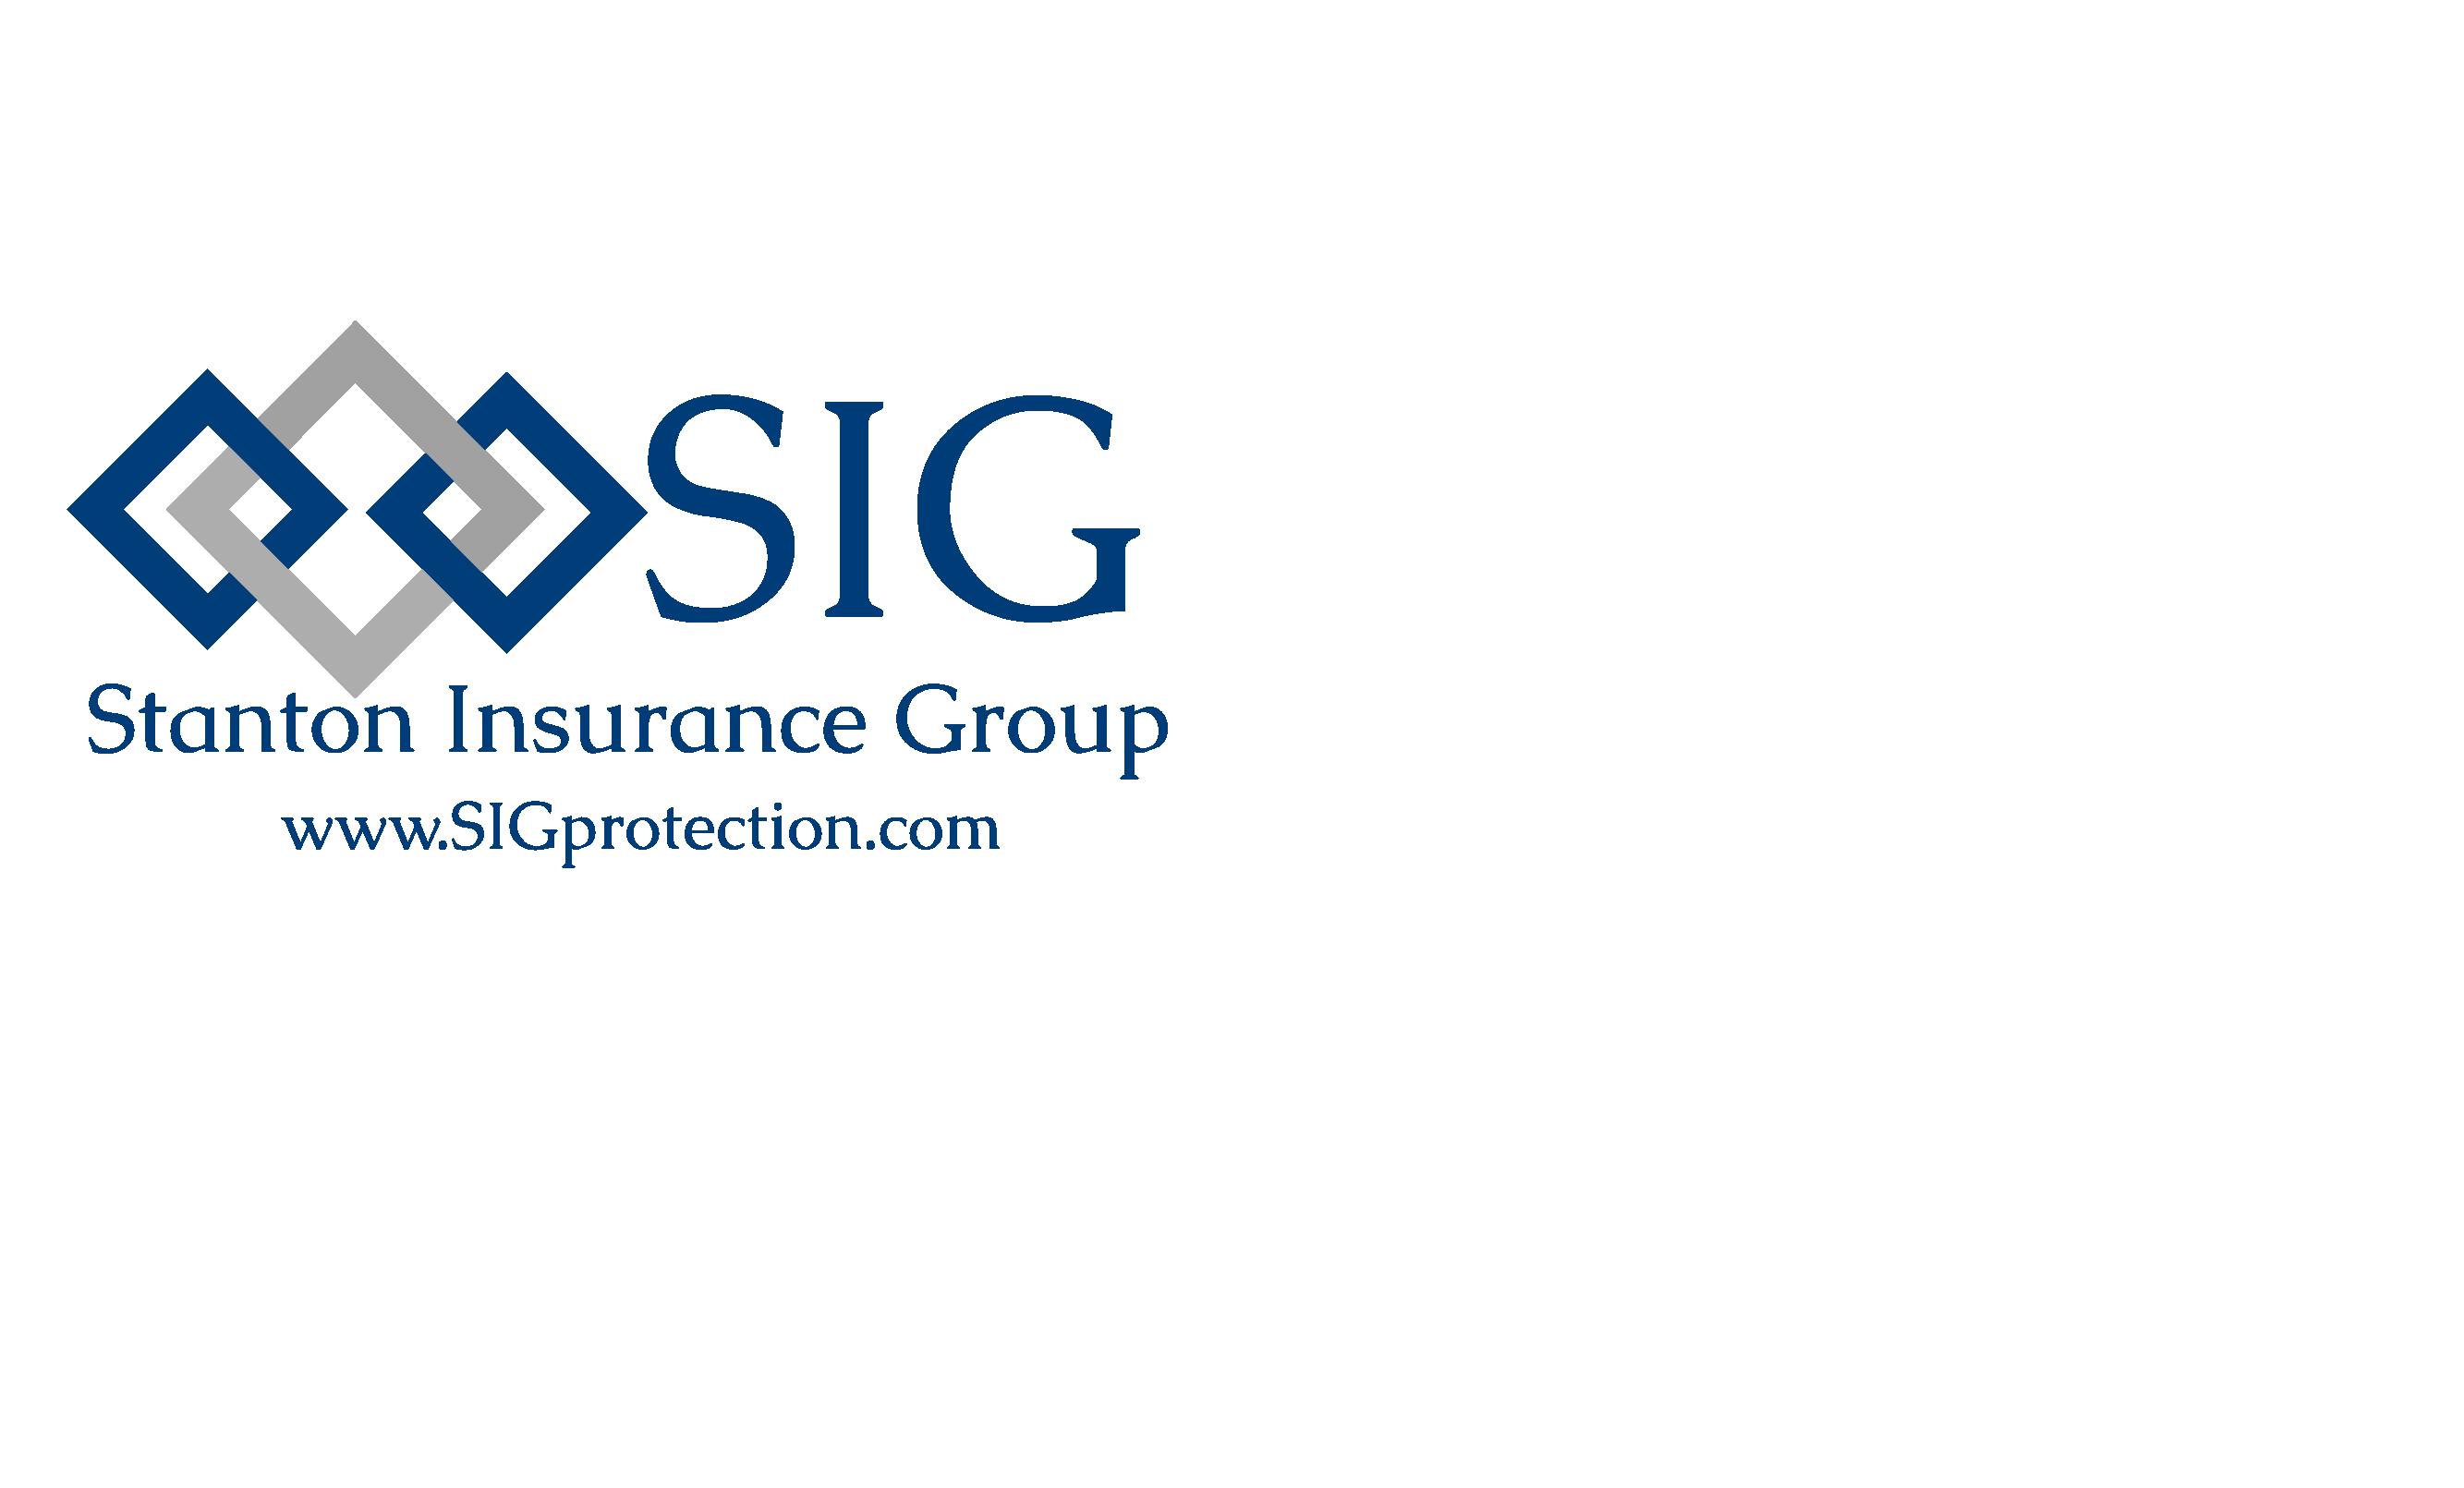 Stanton Insurance Group